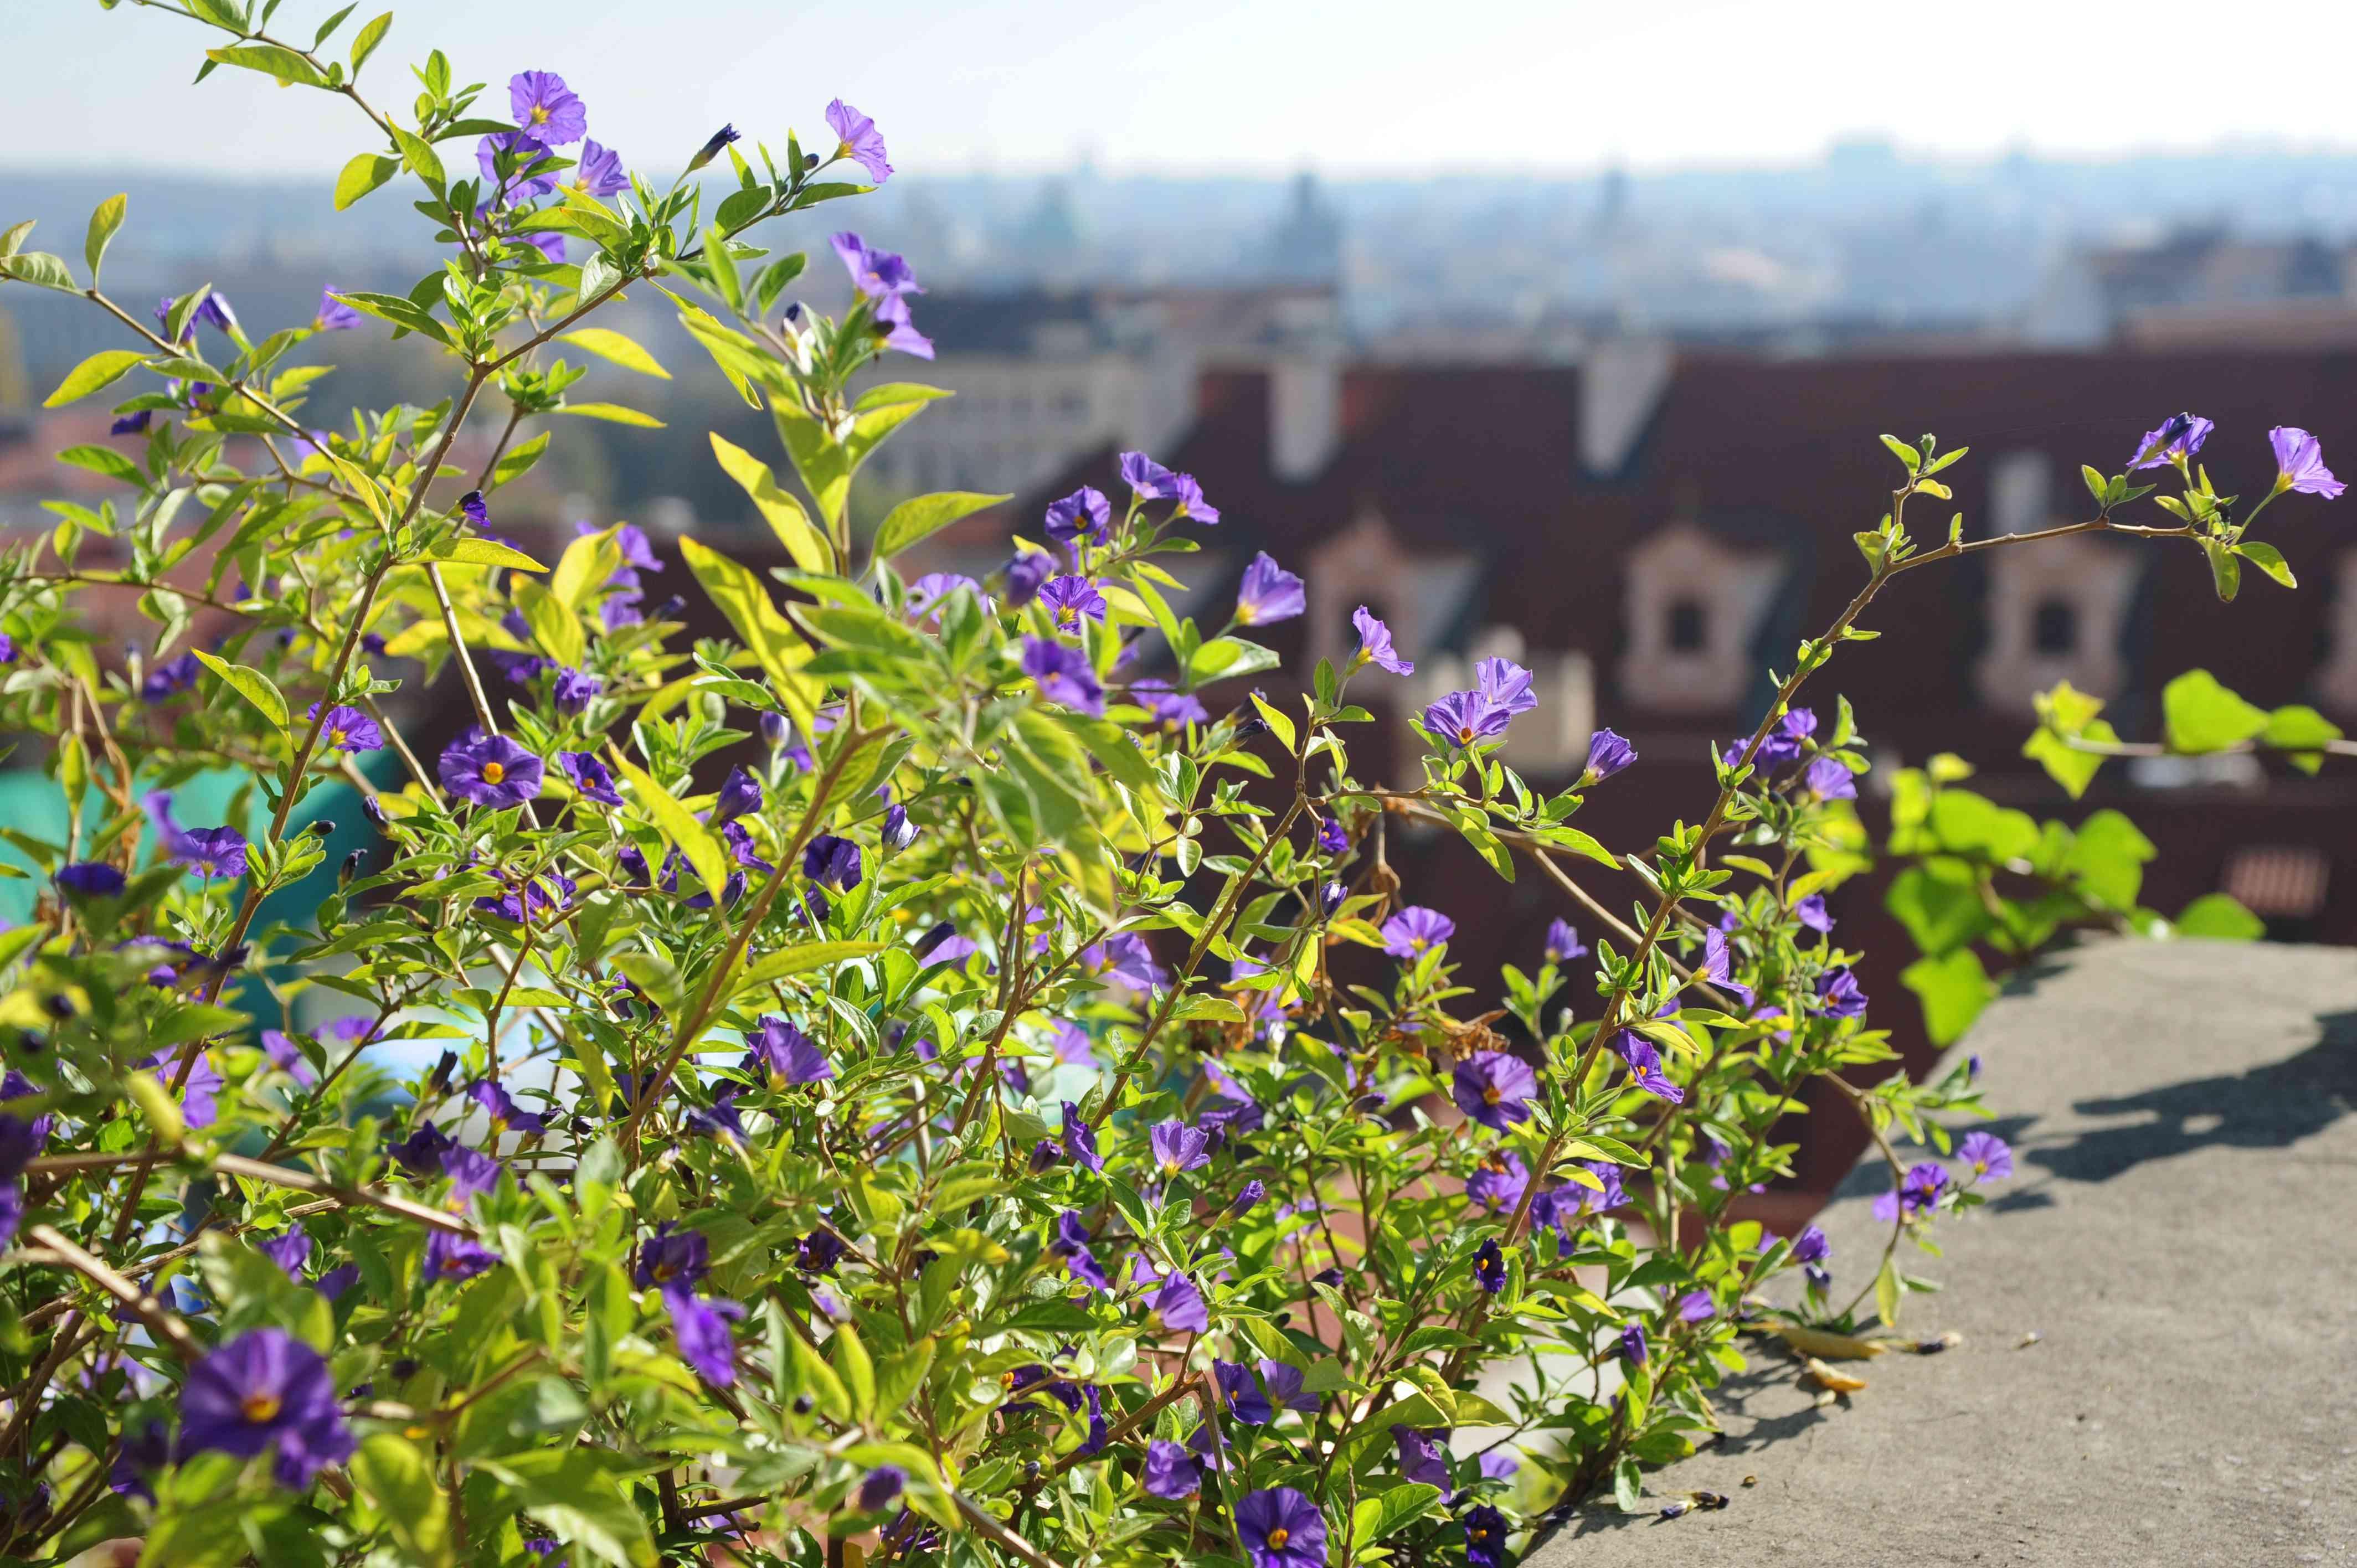 Blue potato bush plant with purple flowers on sunny ledge